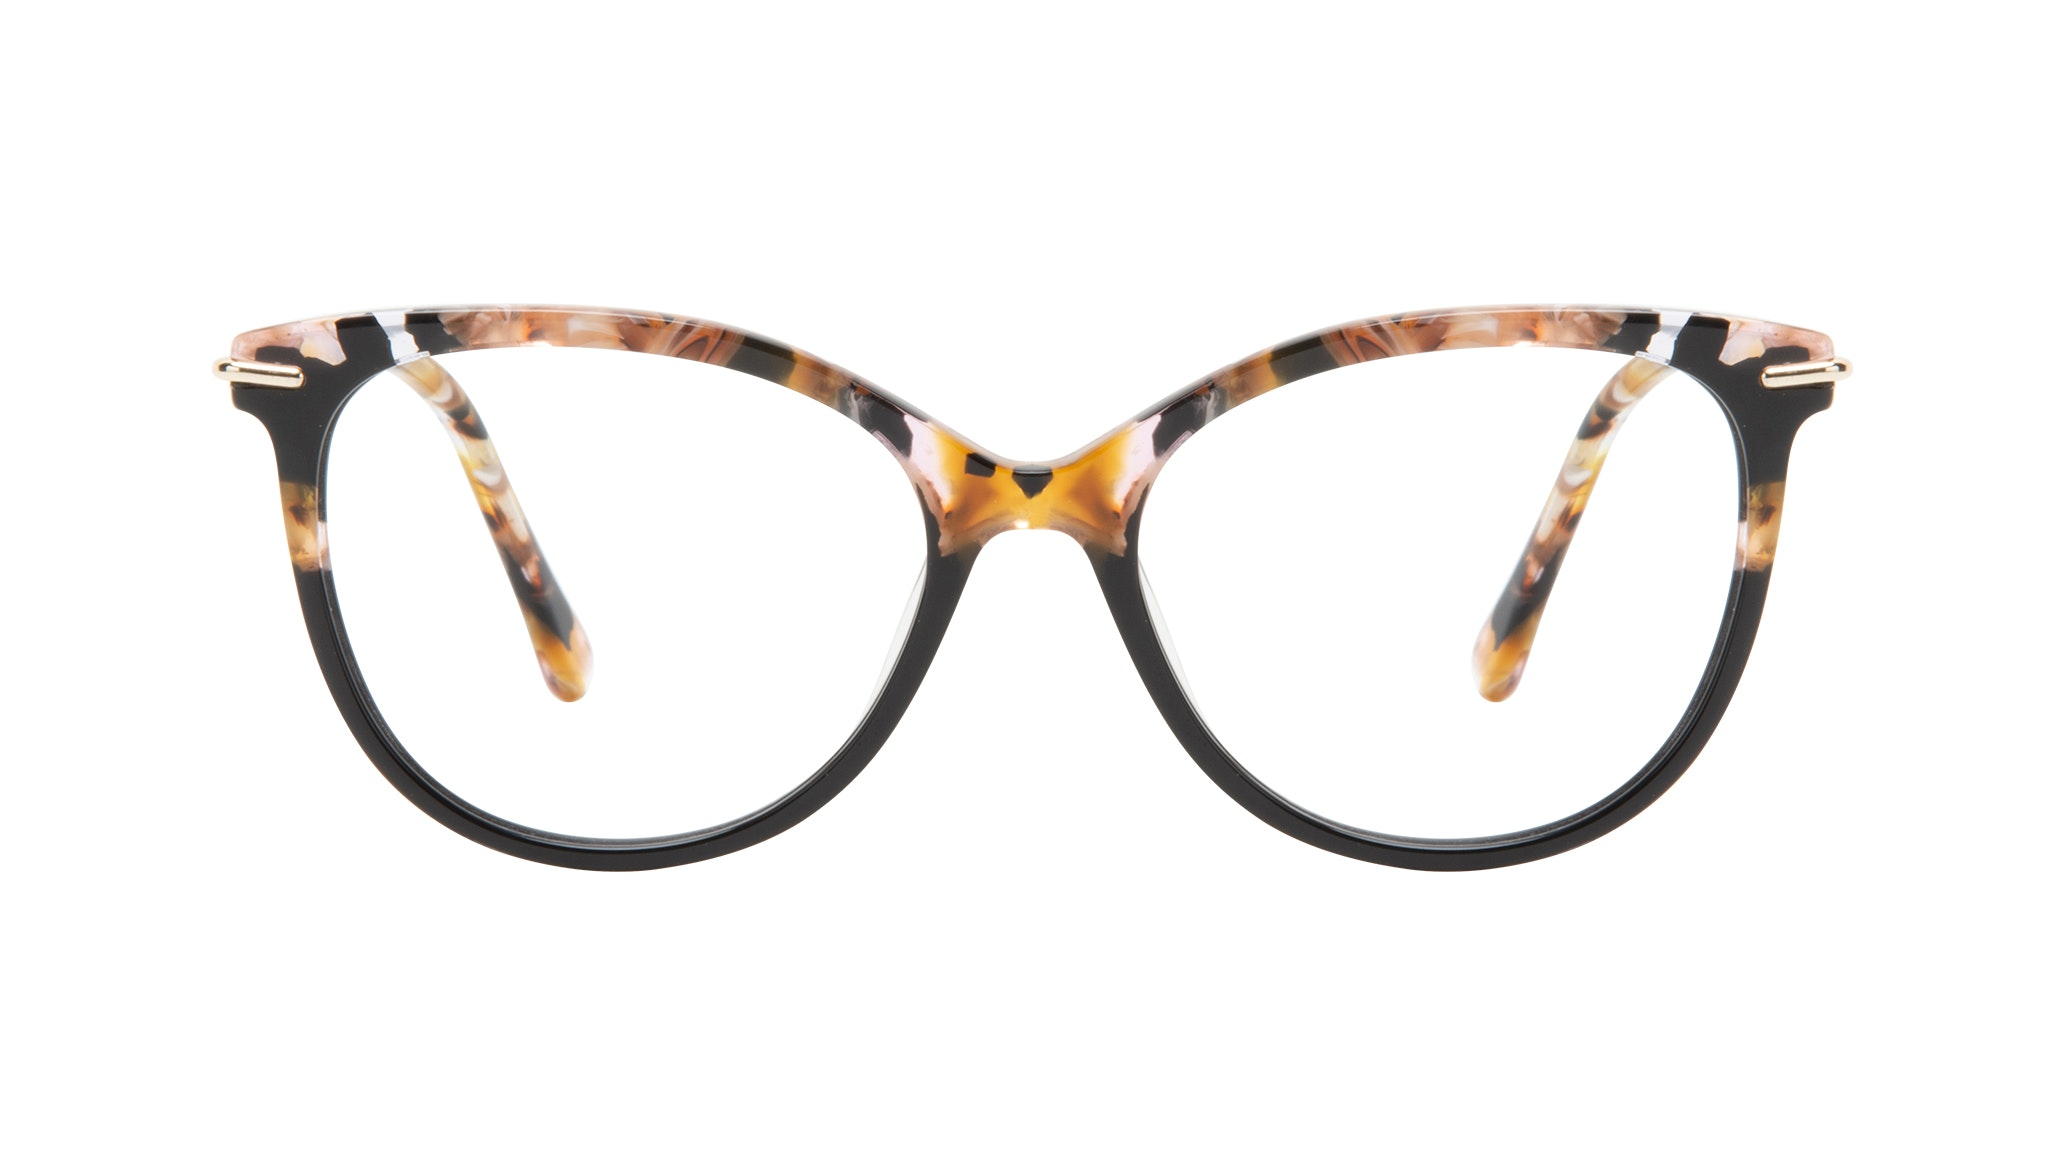 Affordable Fashion Glasses Round Eyeglasses Women Sublime Black Flake Front